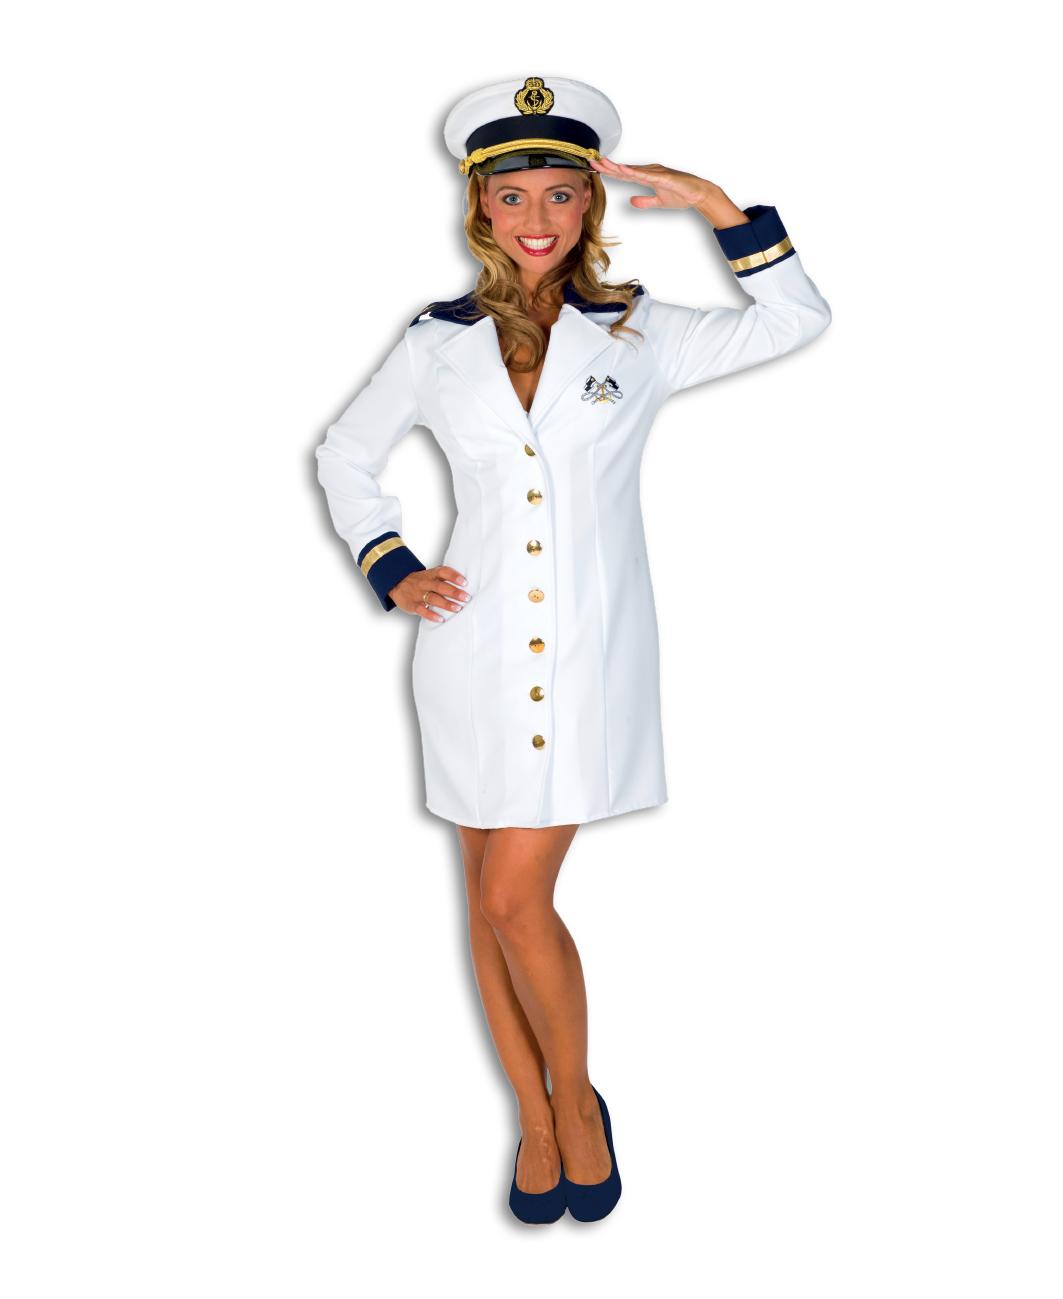 Kapiteins jurk de luxe